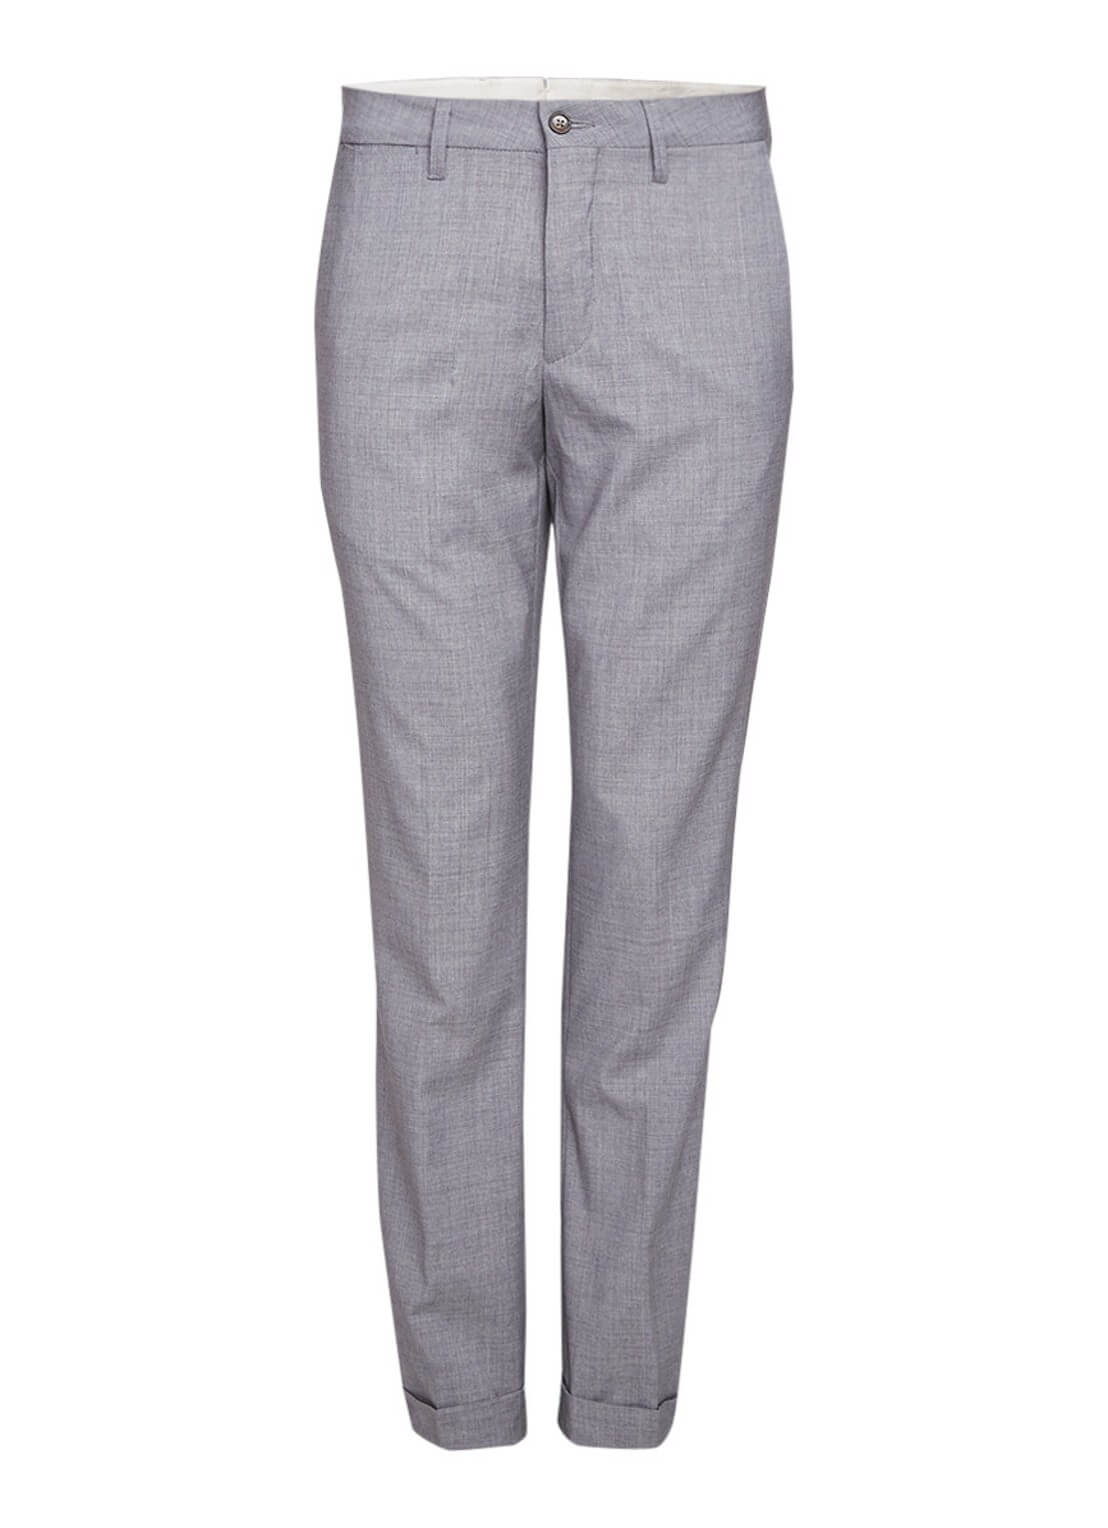 Trousers - Mr.Draper